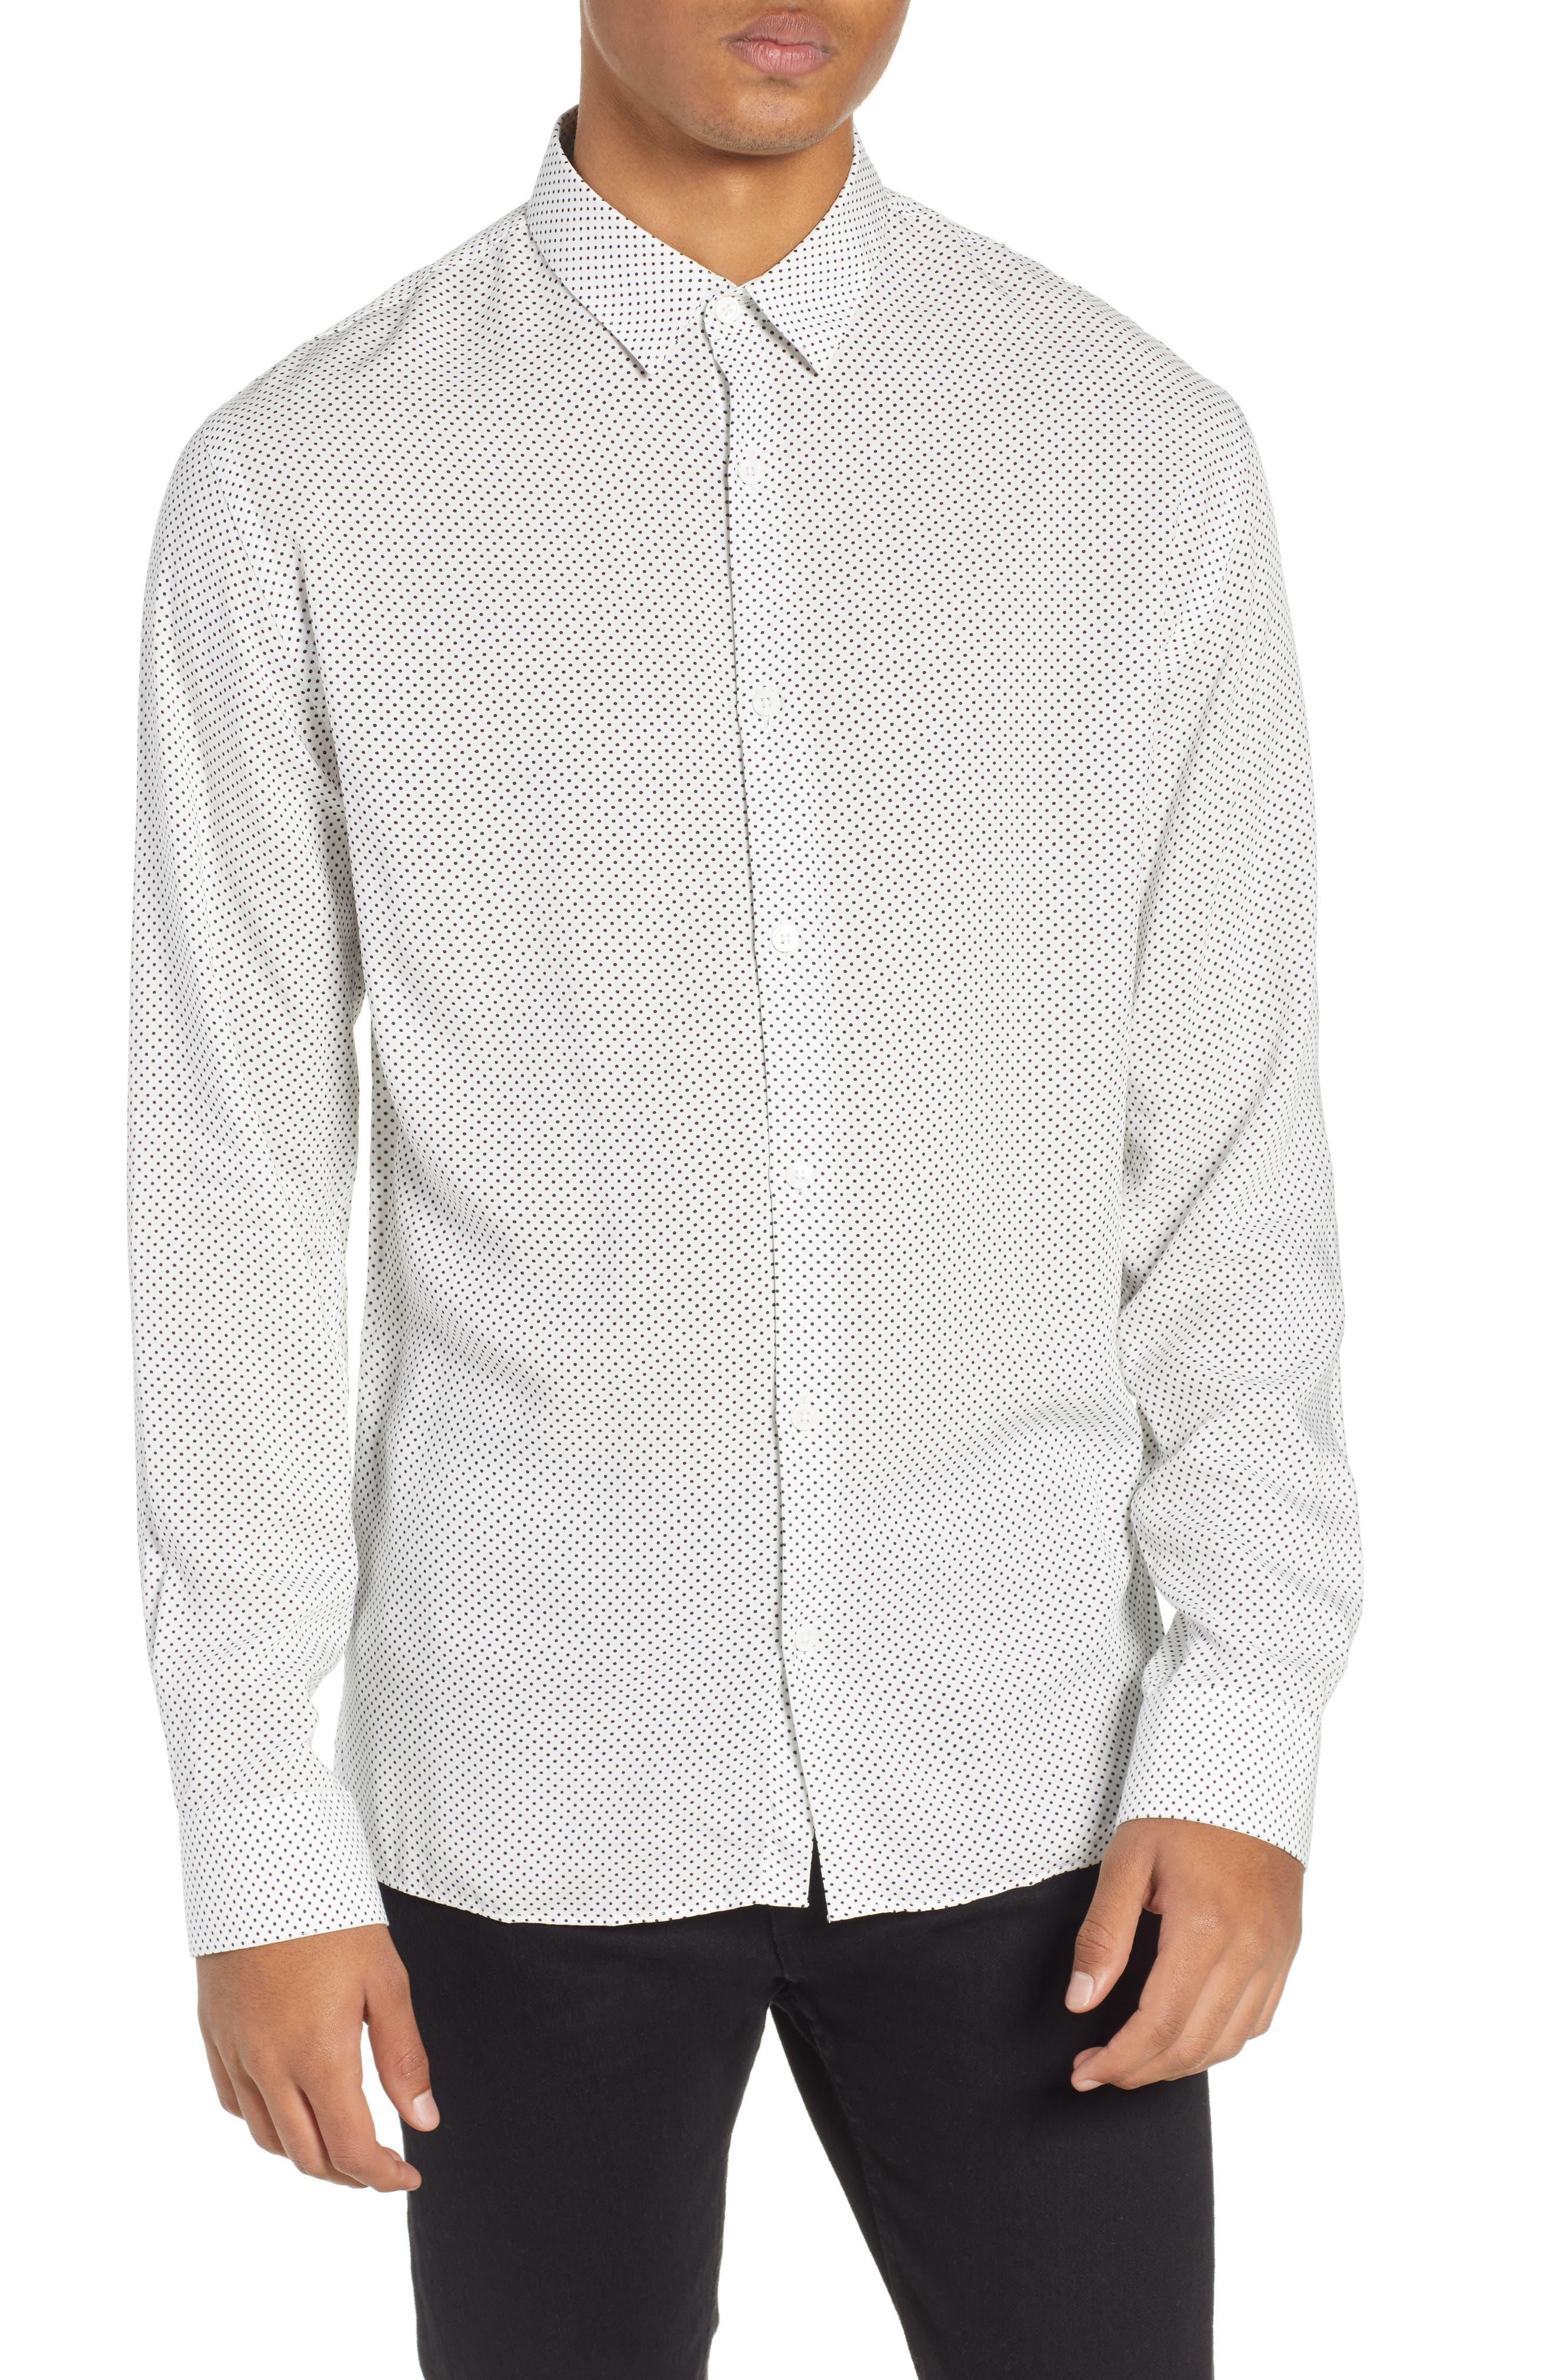 THE KOOPLES, Dot Print Sport Shirt, Main thumbnail 1, color, BEIGE-BLACK